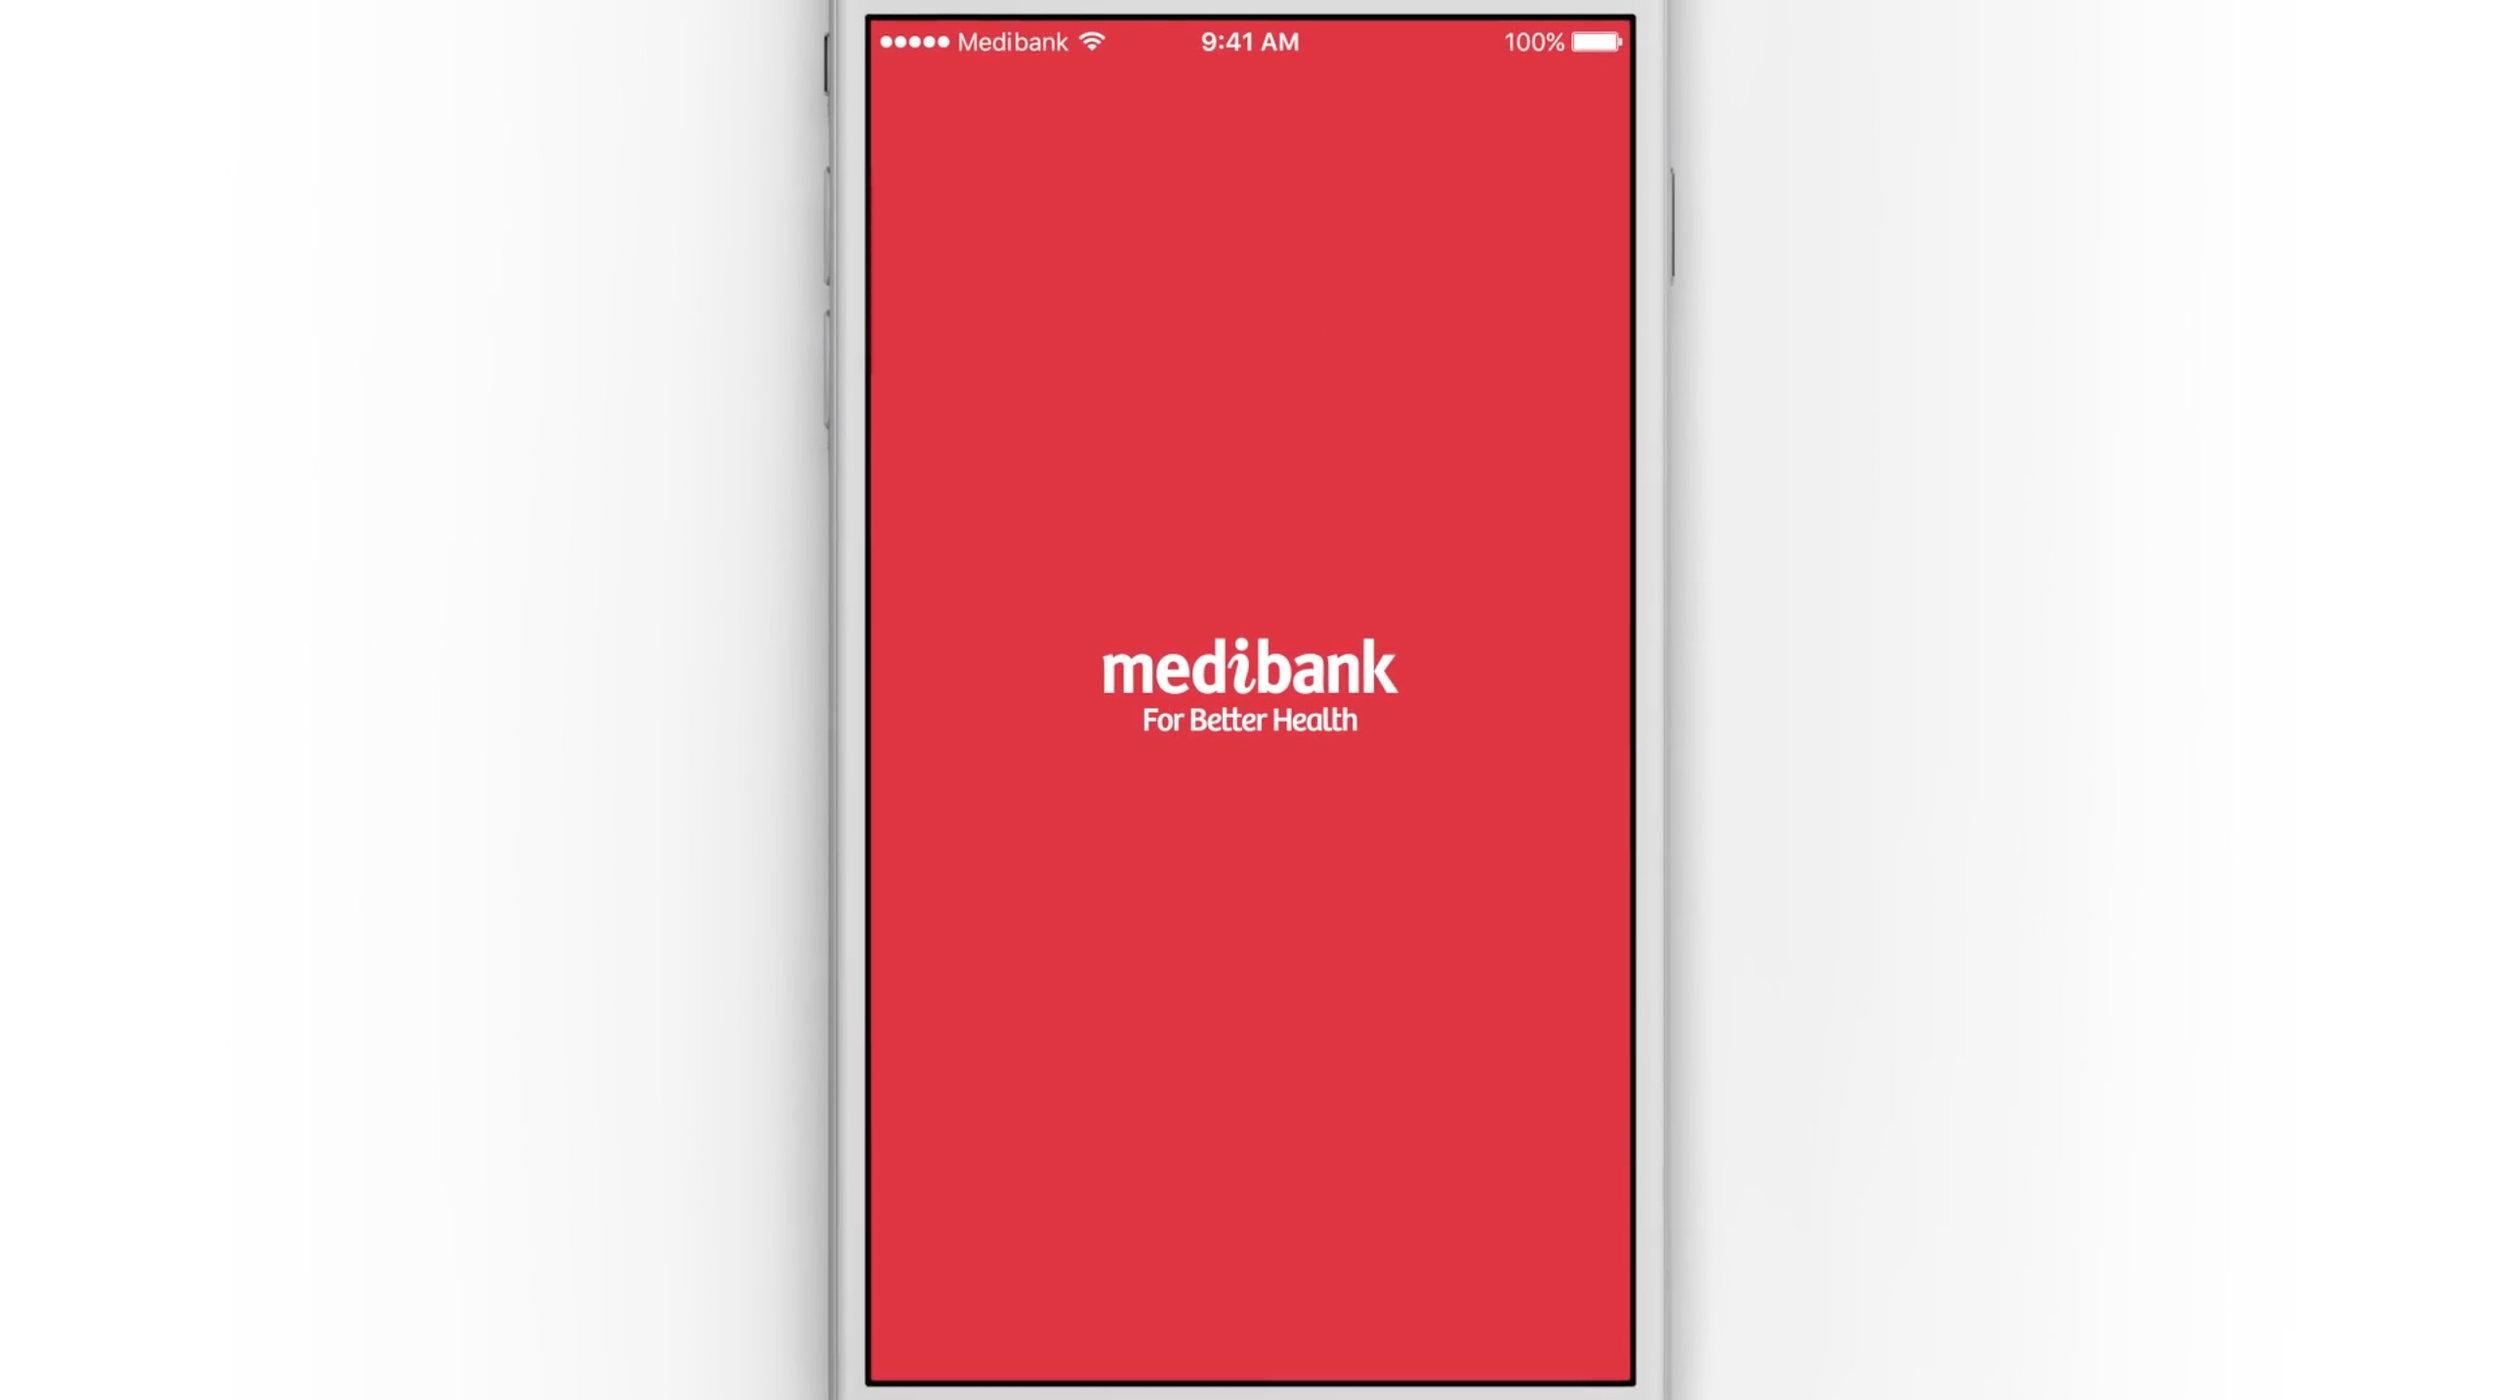 medibank app